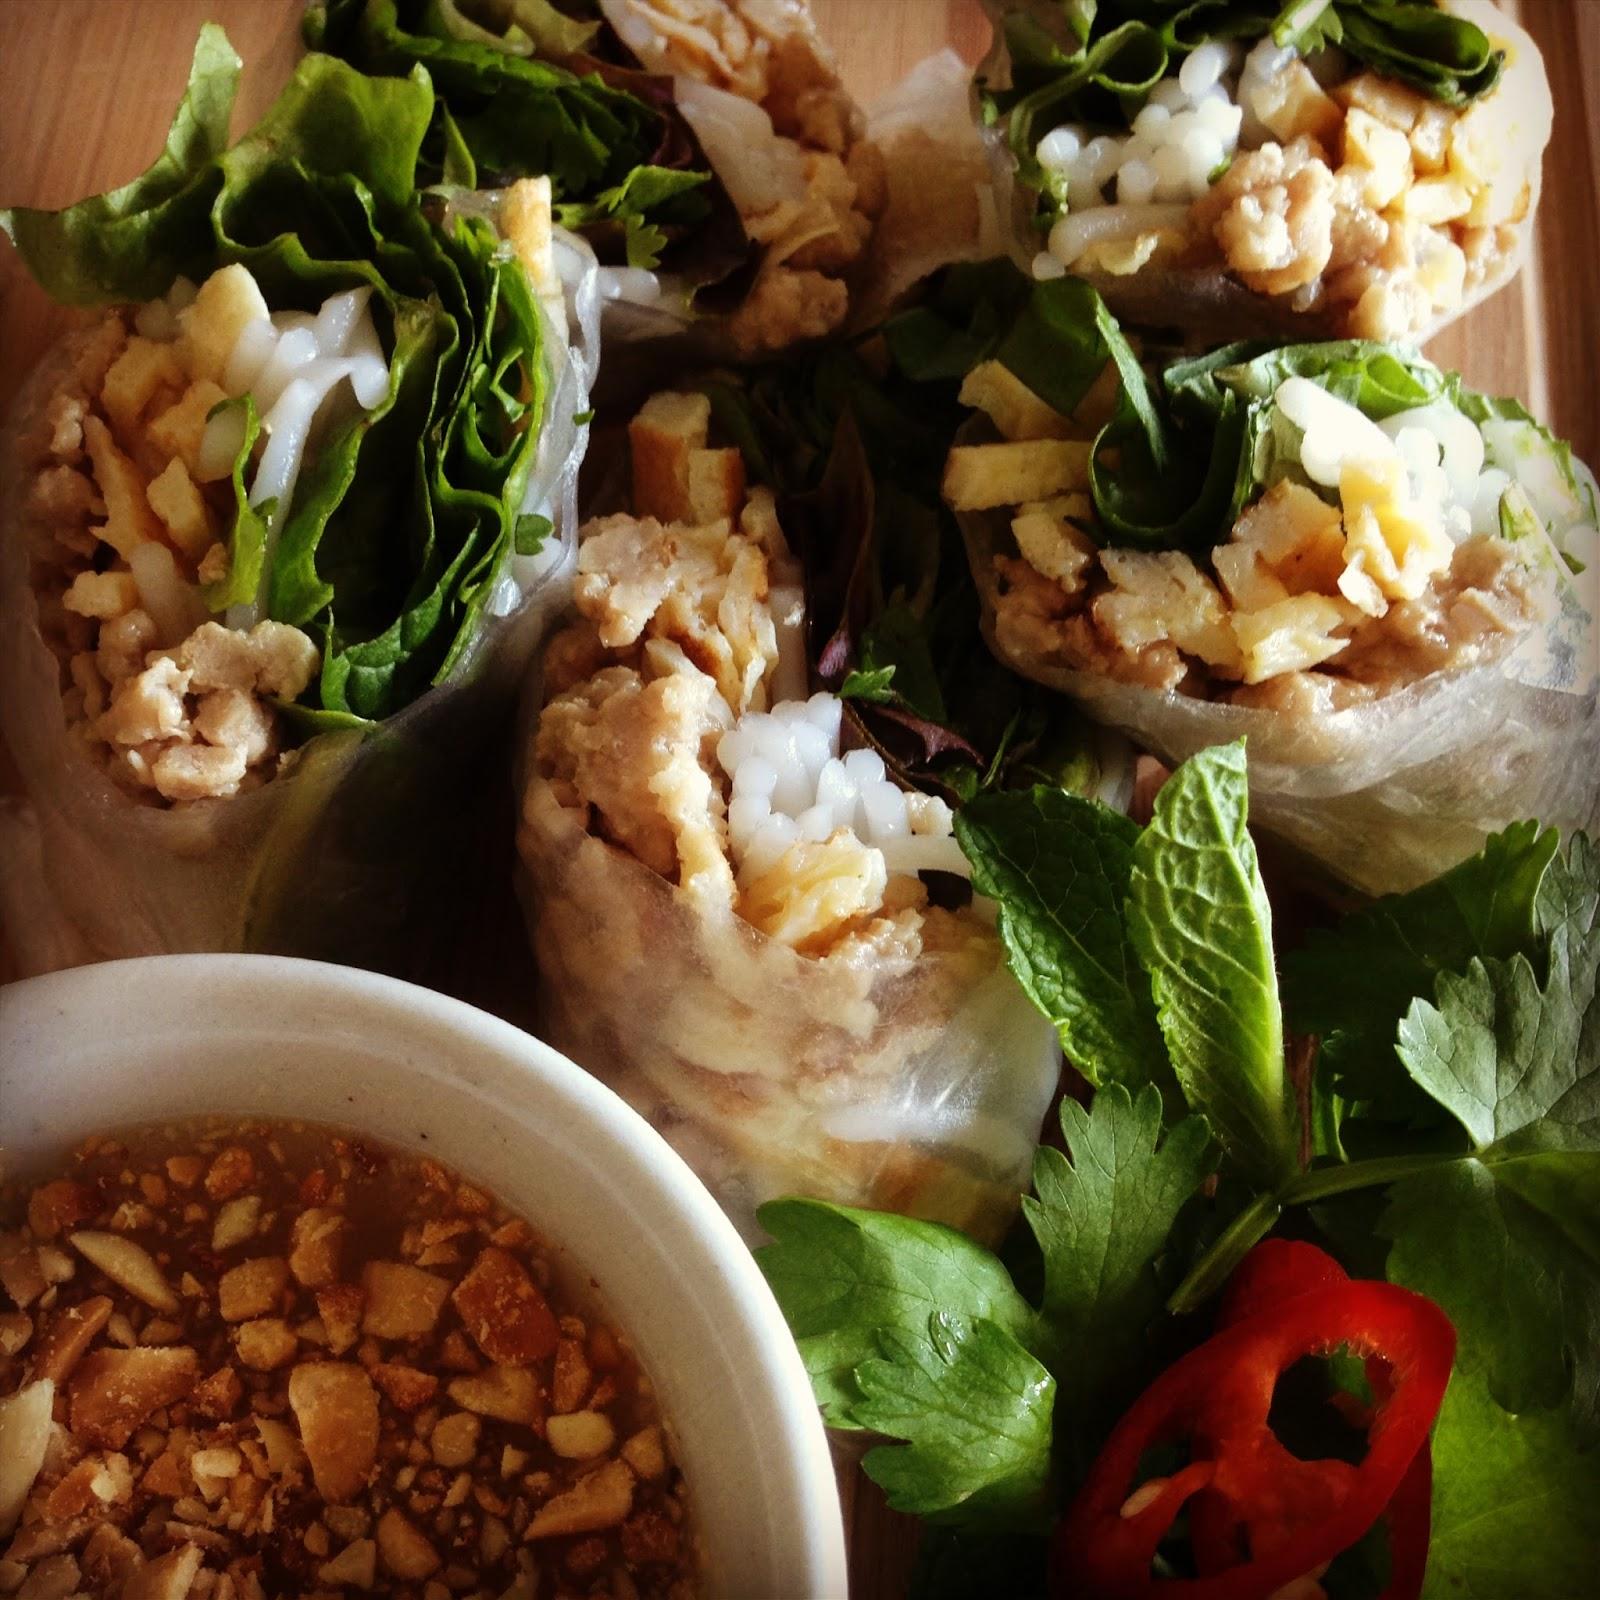 Yaw Kao – Fresh spring rolls via: DaiandDal.com